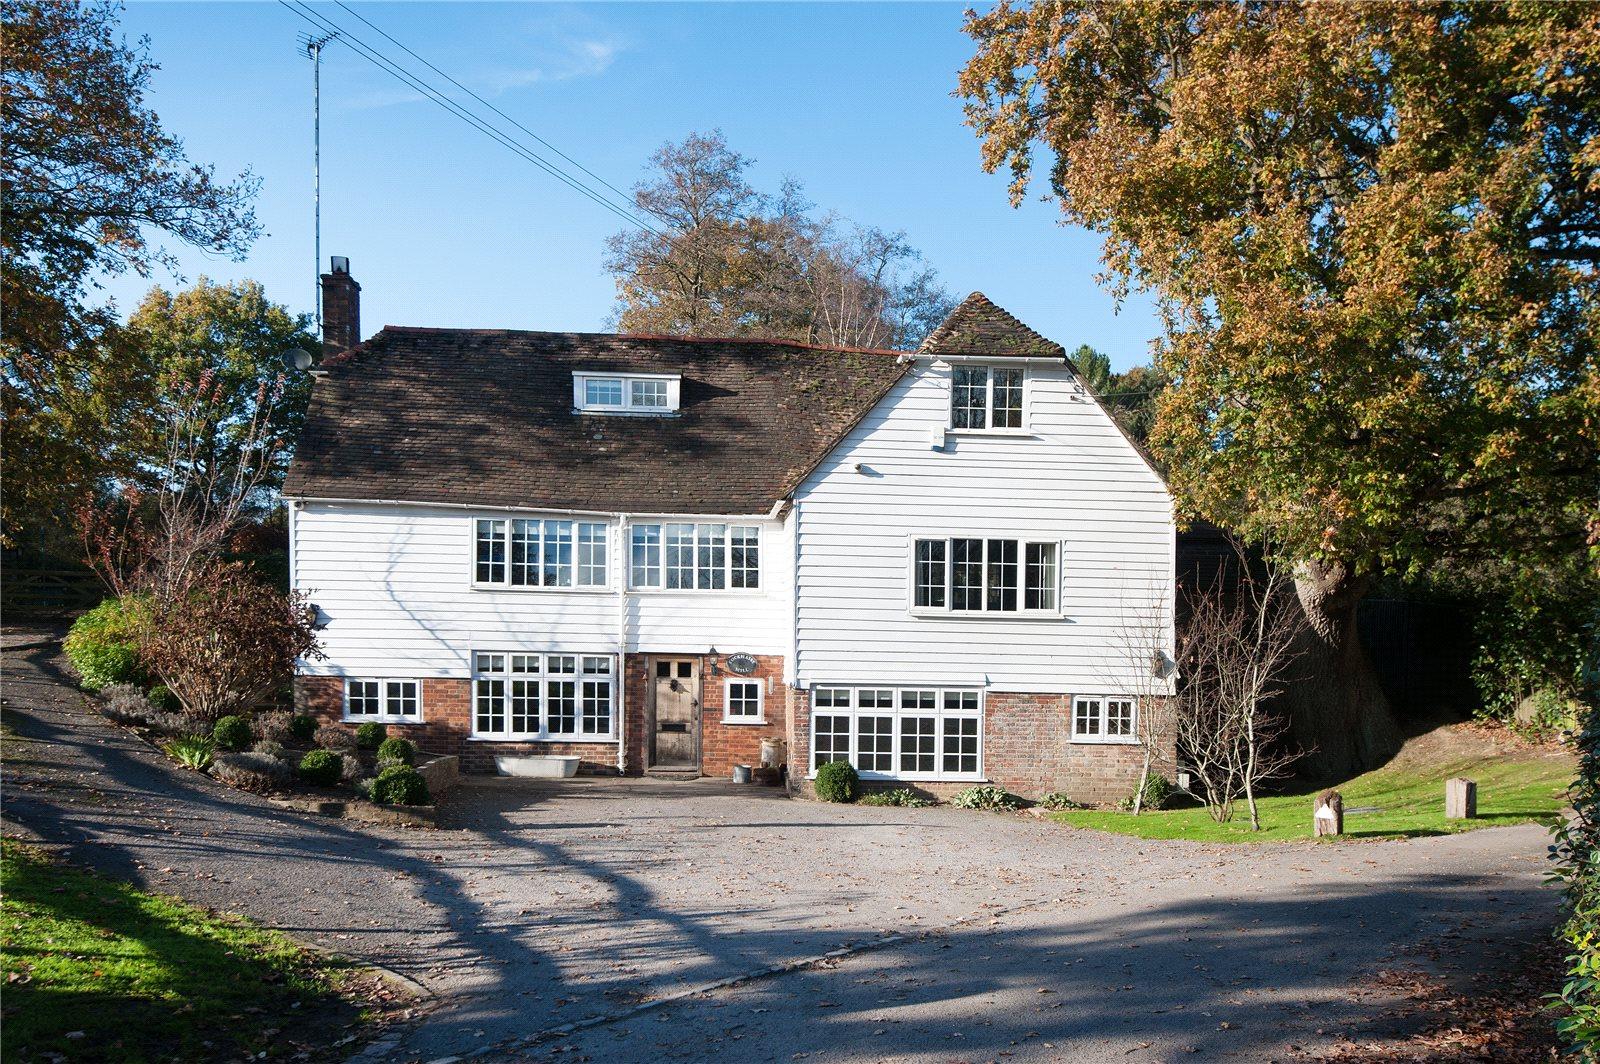 獨棟家庭住宅 為 出售 在 Monteswood Lane, Lindfield, West Sussex, RH16 Lindfield, 英格蘭